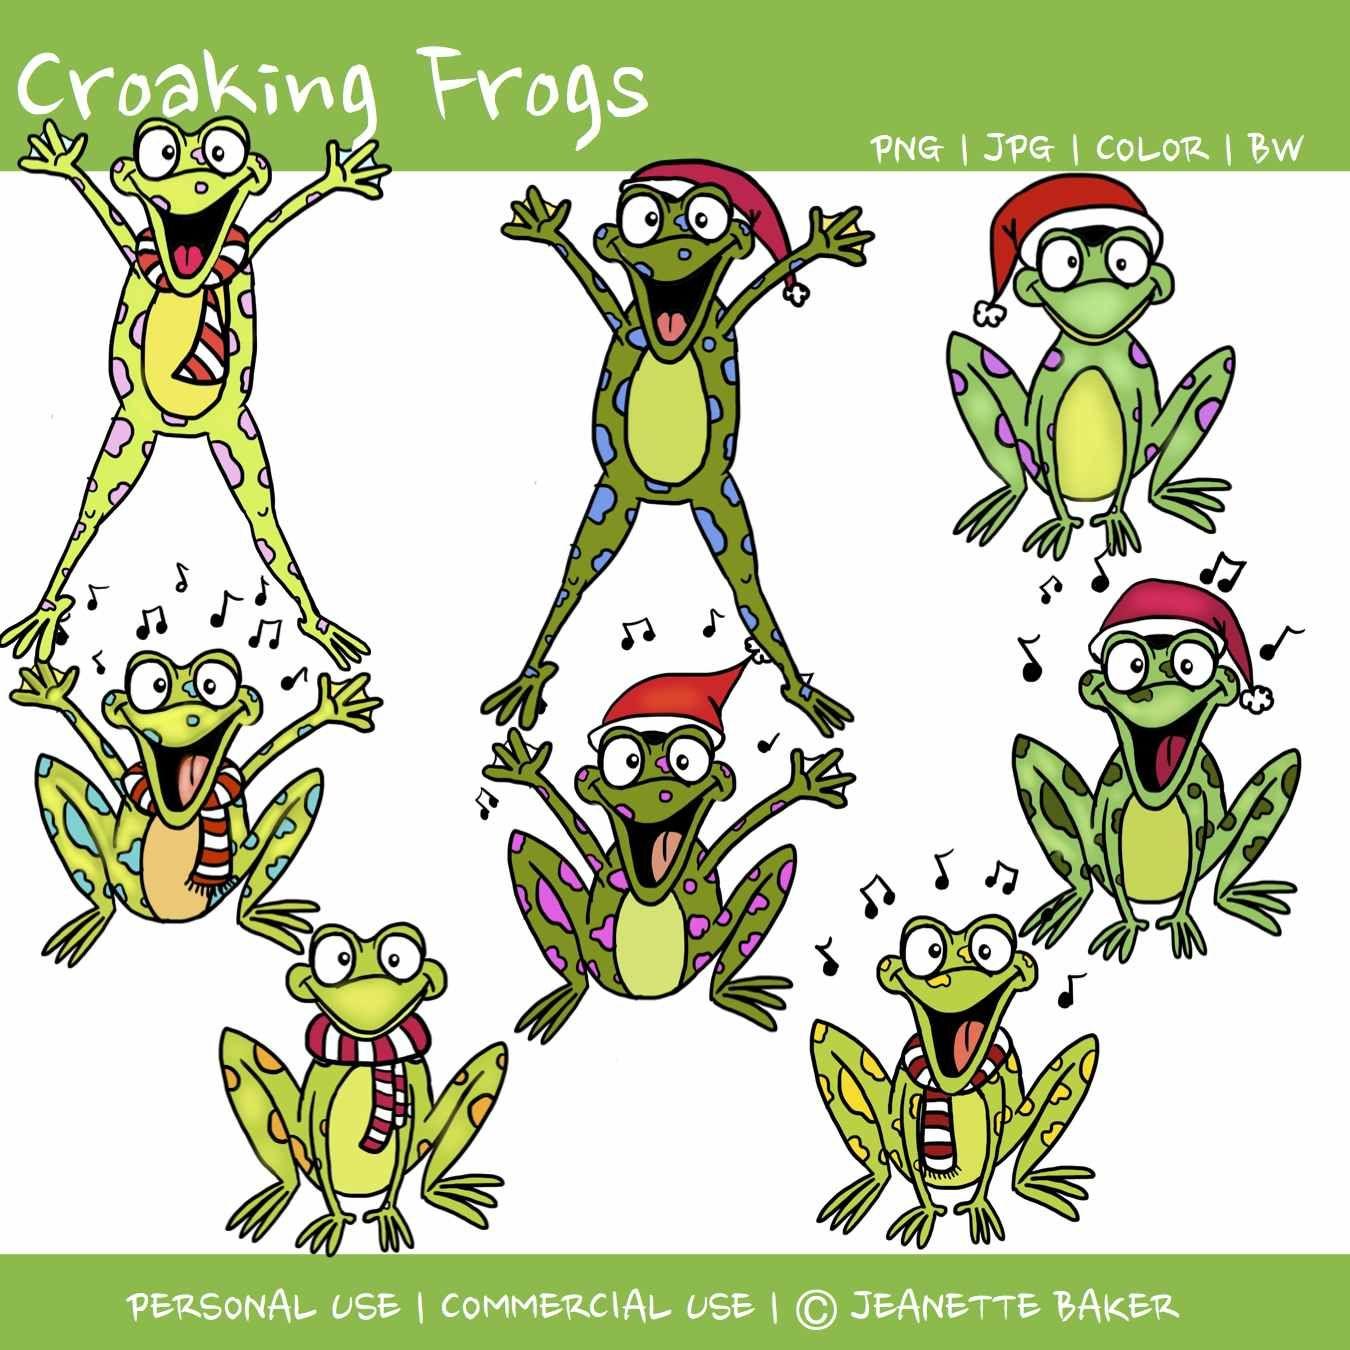 medium resolution of  2 croaking frogs by jeanette baker